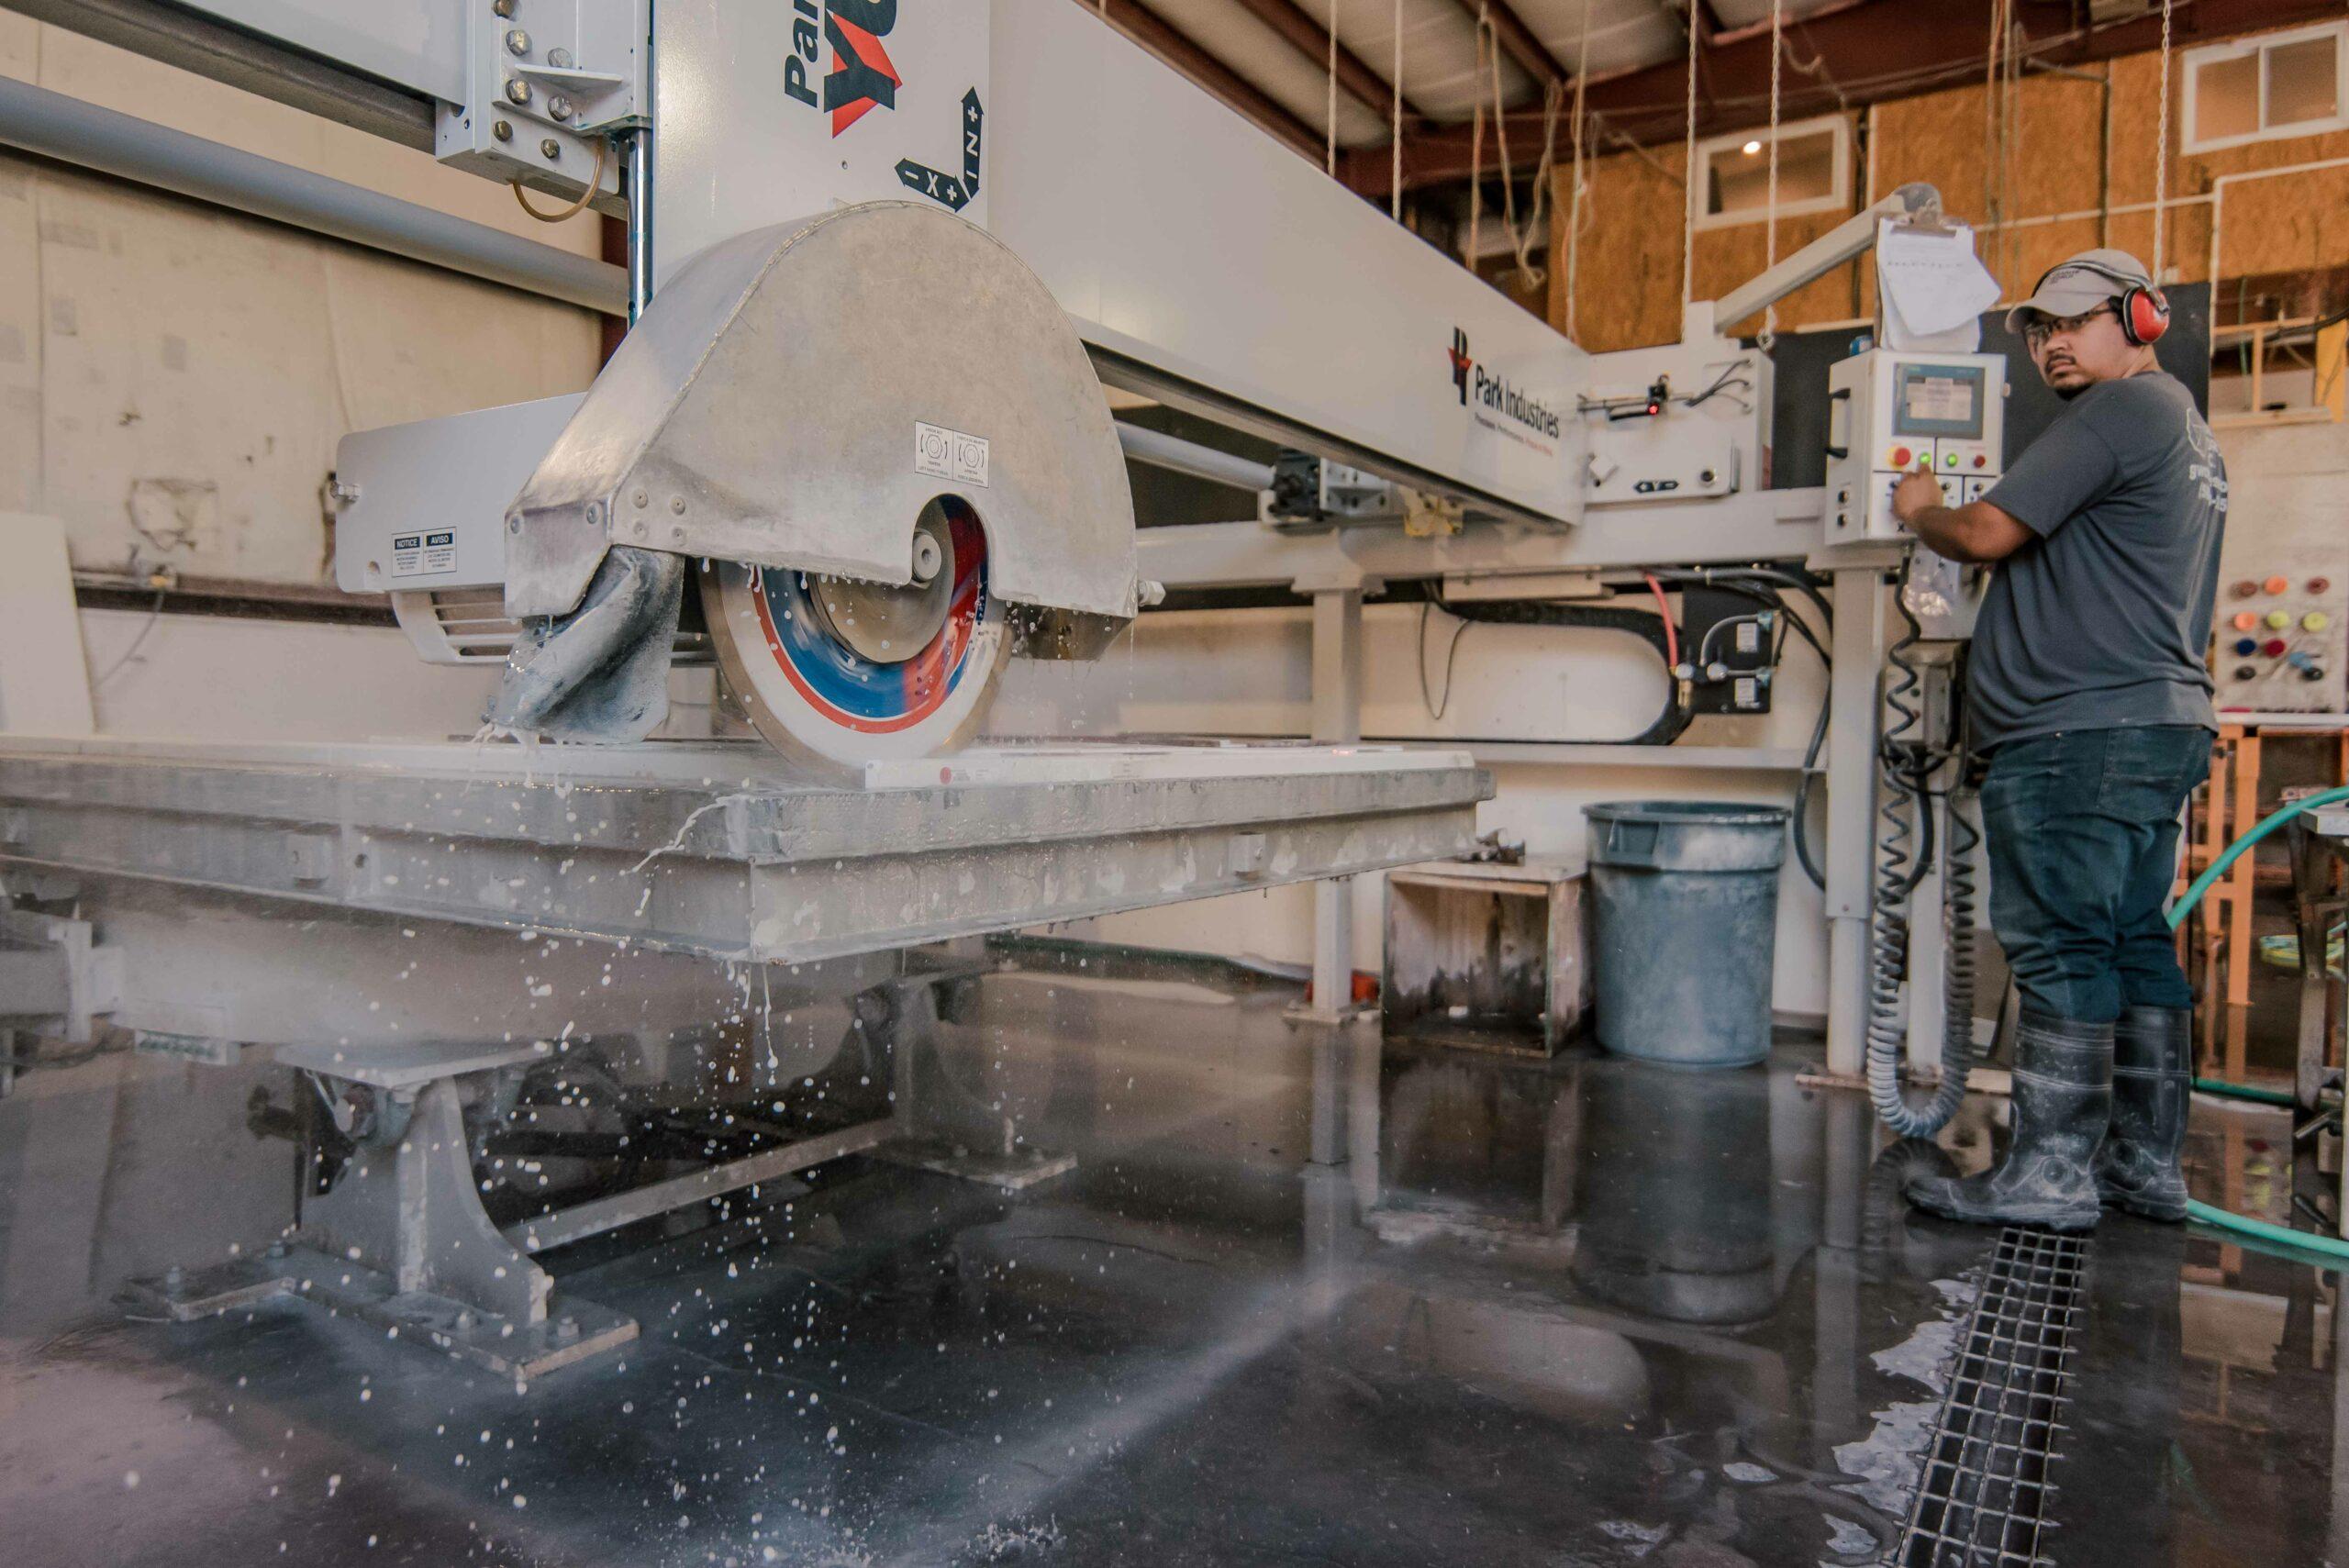 Granite World Employee Working on a fabrication